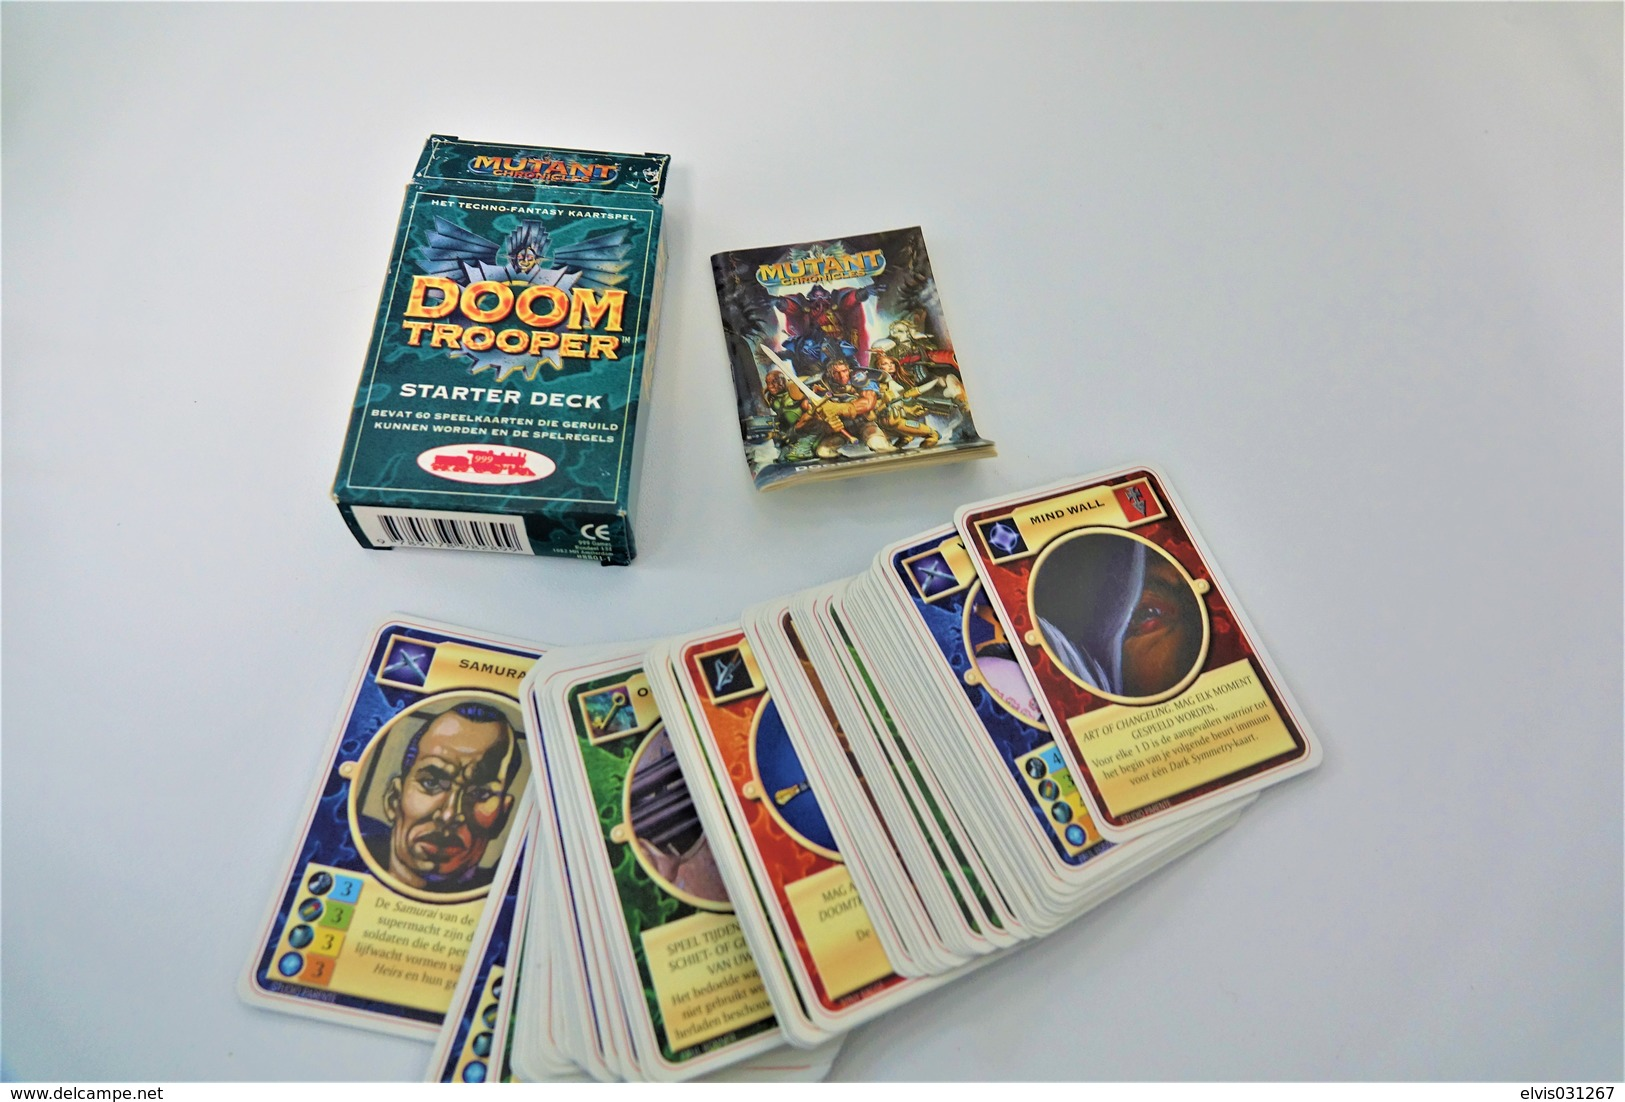 Speelkaarten - Kwartet, DOOM TROOPER - The Cardgame - Rulebook + Starter Deck  Collectible Playing Cards - 1995 - Cartes à Jouer Classiques